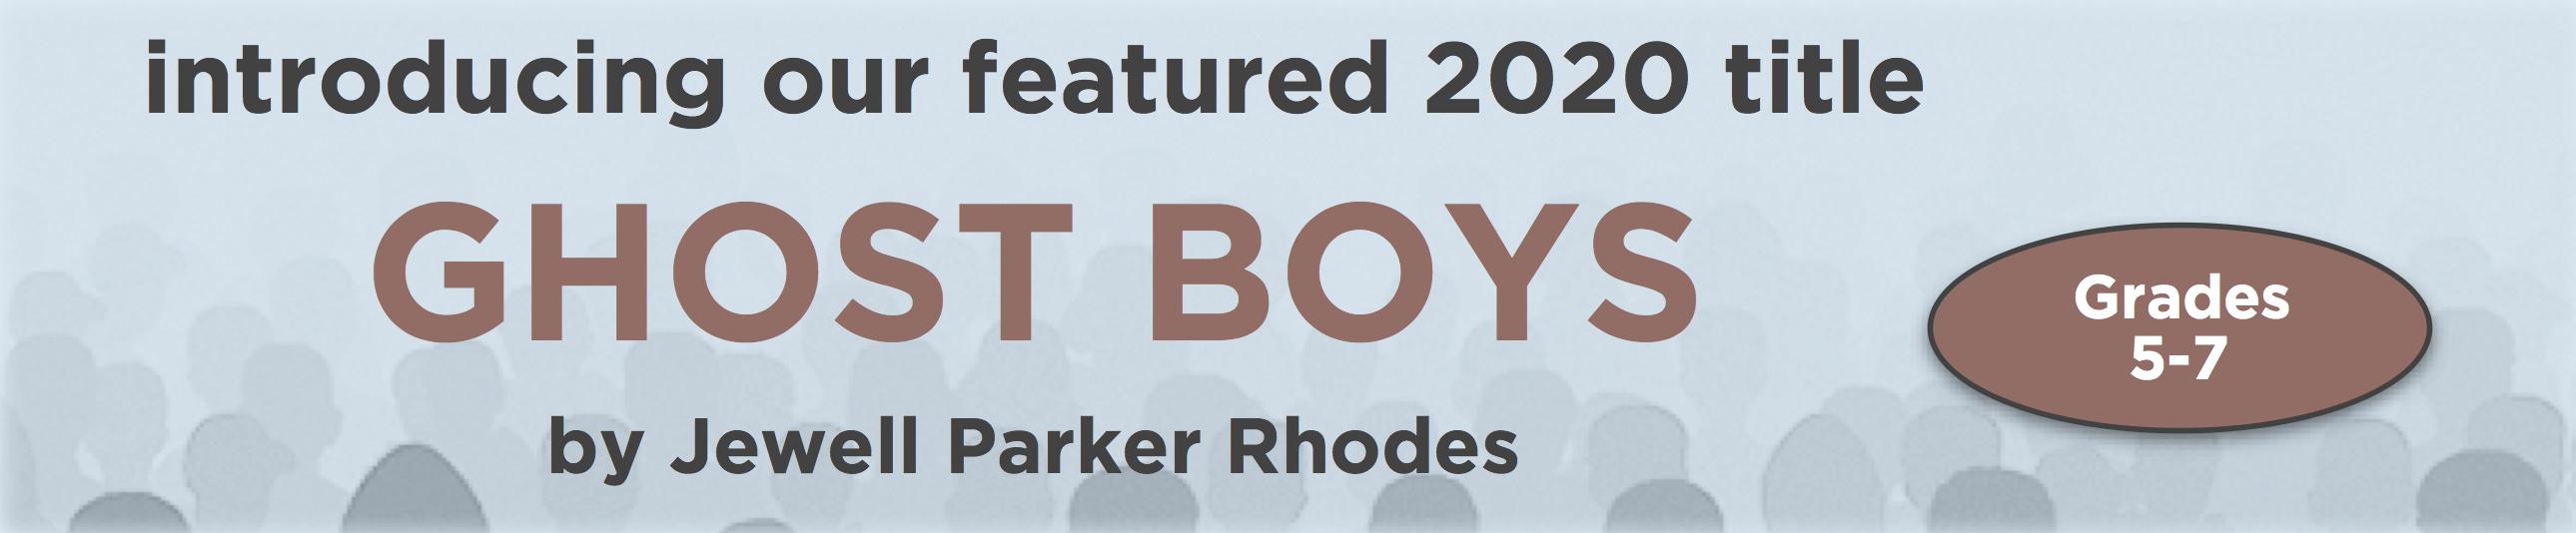 ghost-boys-headline